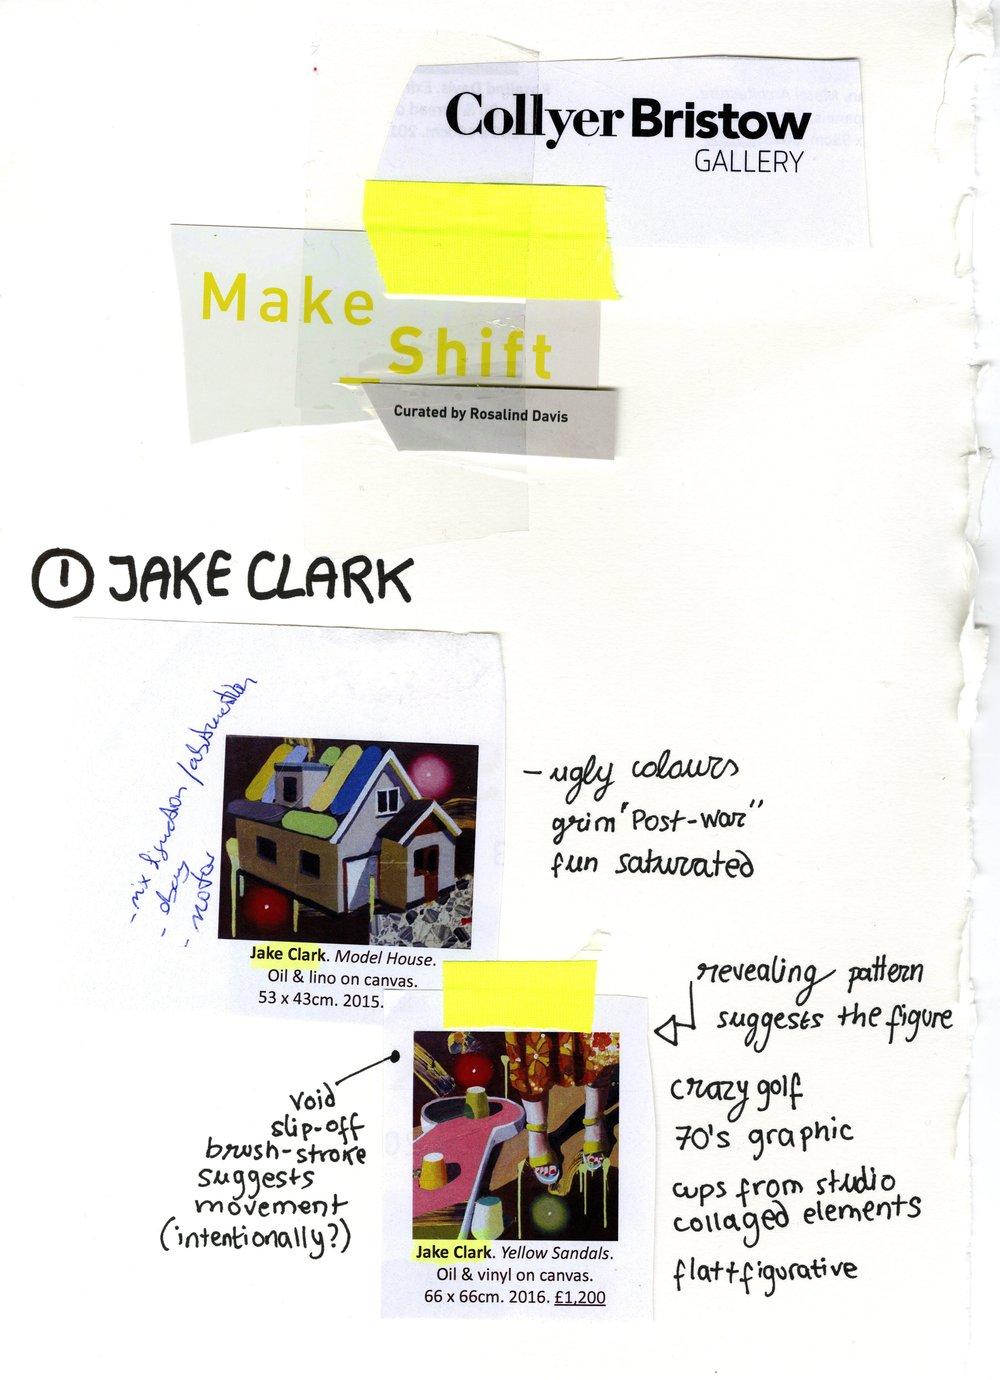 Make_Shift_001.jpg